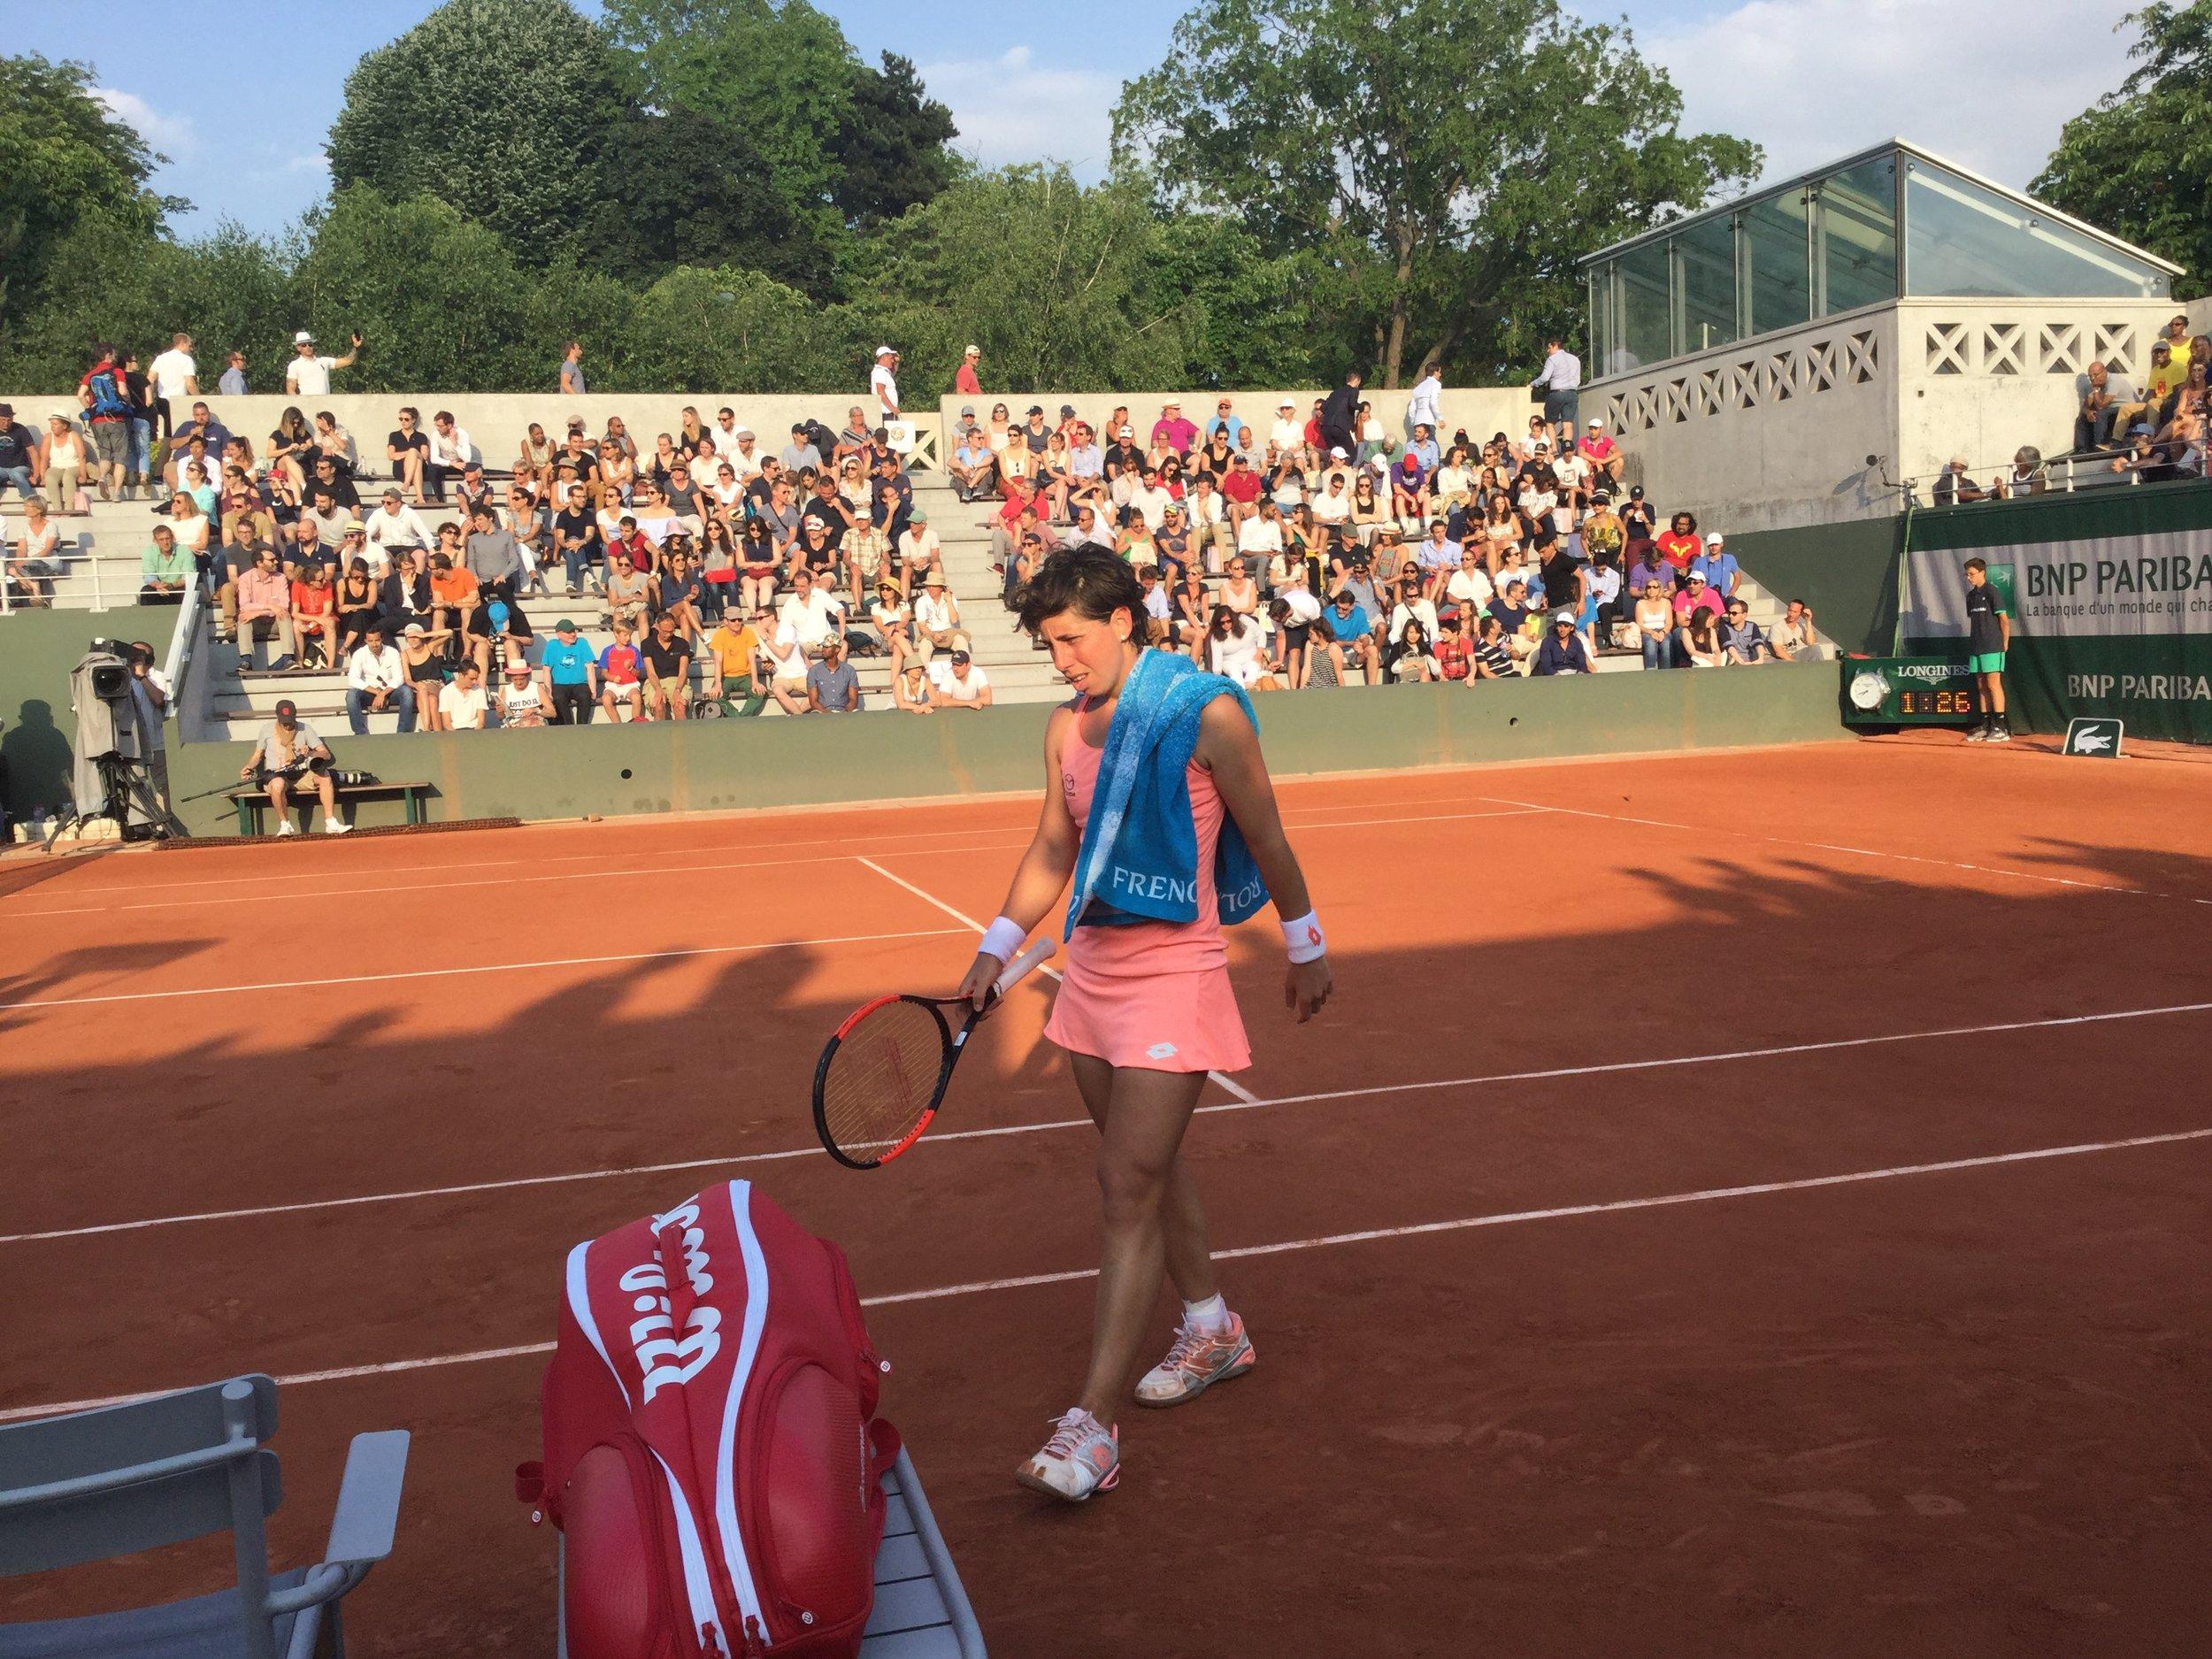 Then we saw Spain's Carla Suarez Navarro win her game against Roumanian Sorana Cirstea.